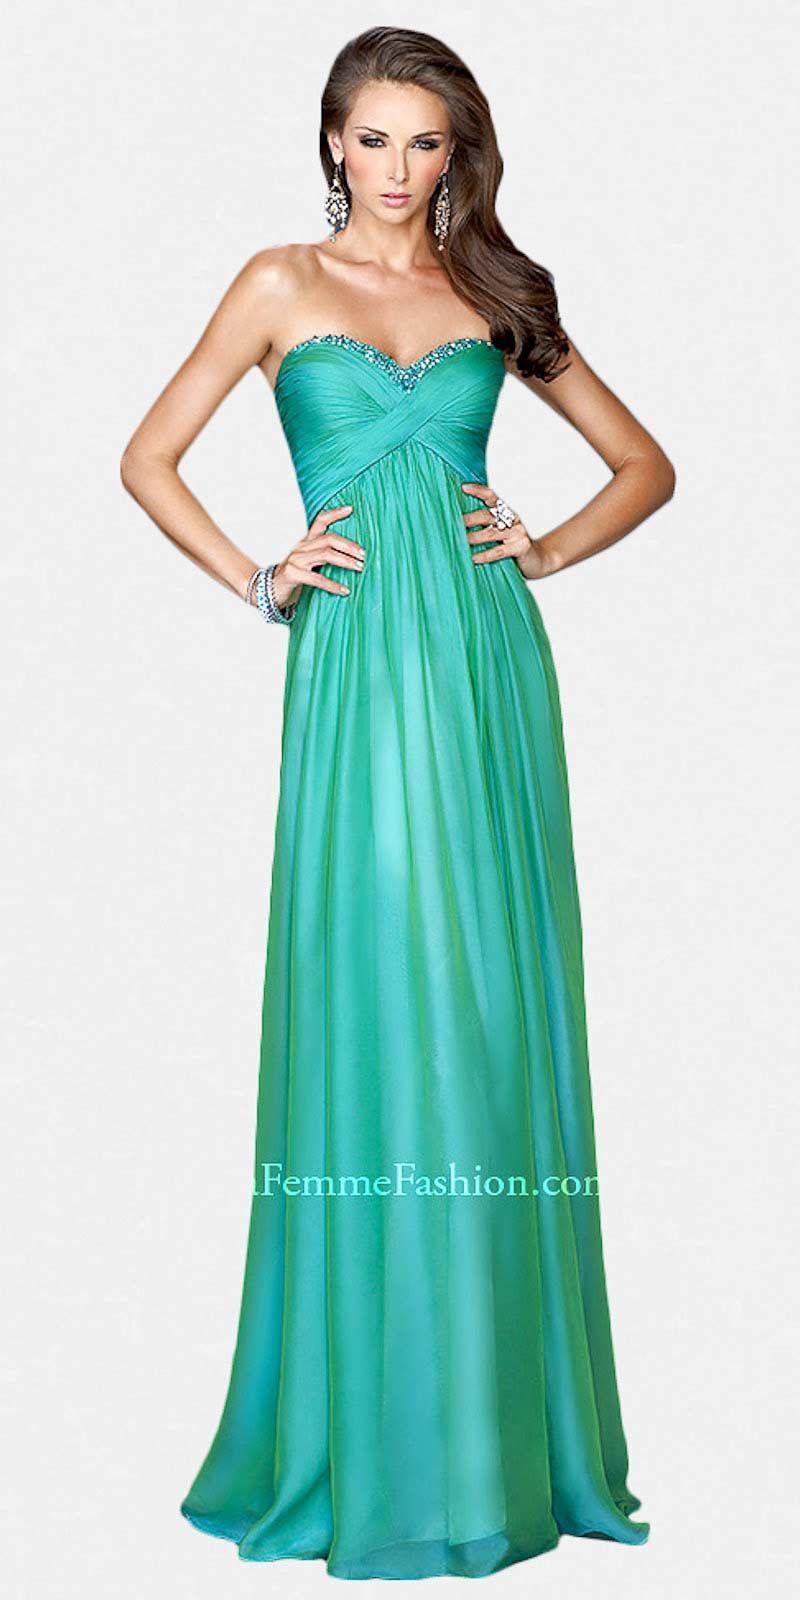 Basic Strapless Sweetheart Column Prom Dresses by La Femme | fashion ...